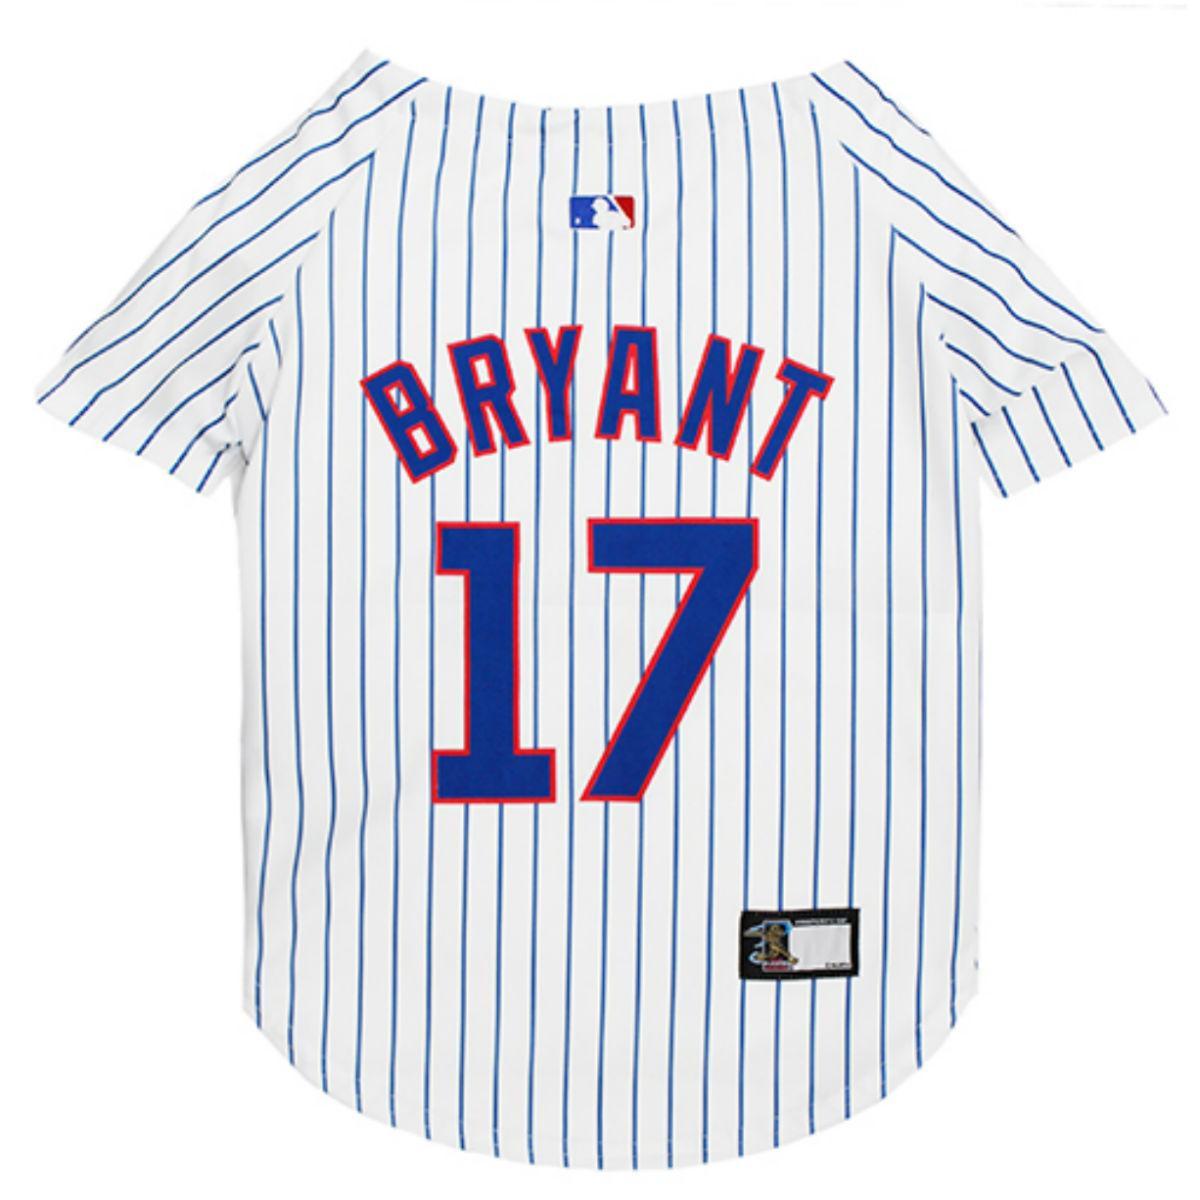 Chicago Cubs Kris Bryant Dog Jersey - Pinstripe